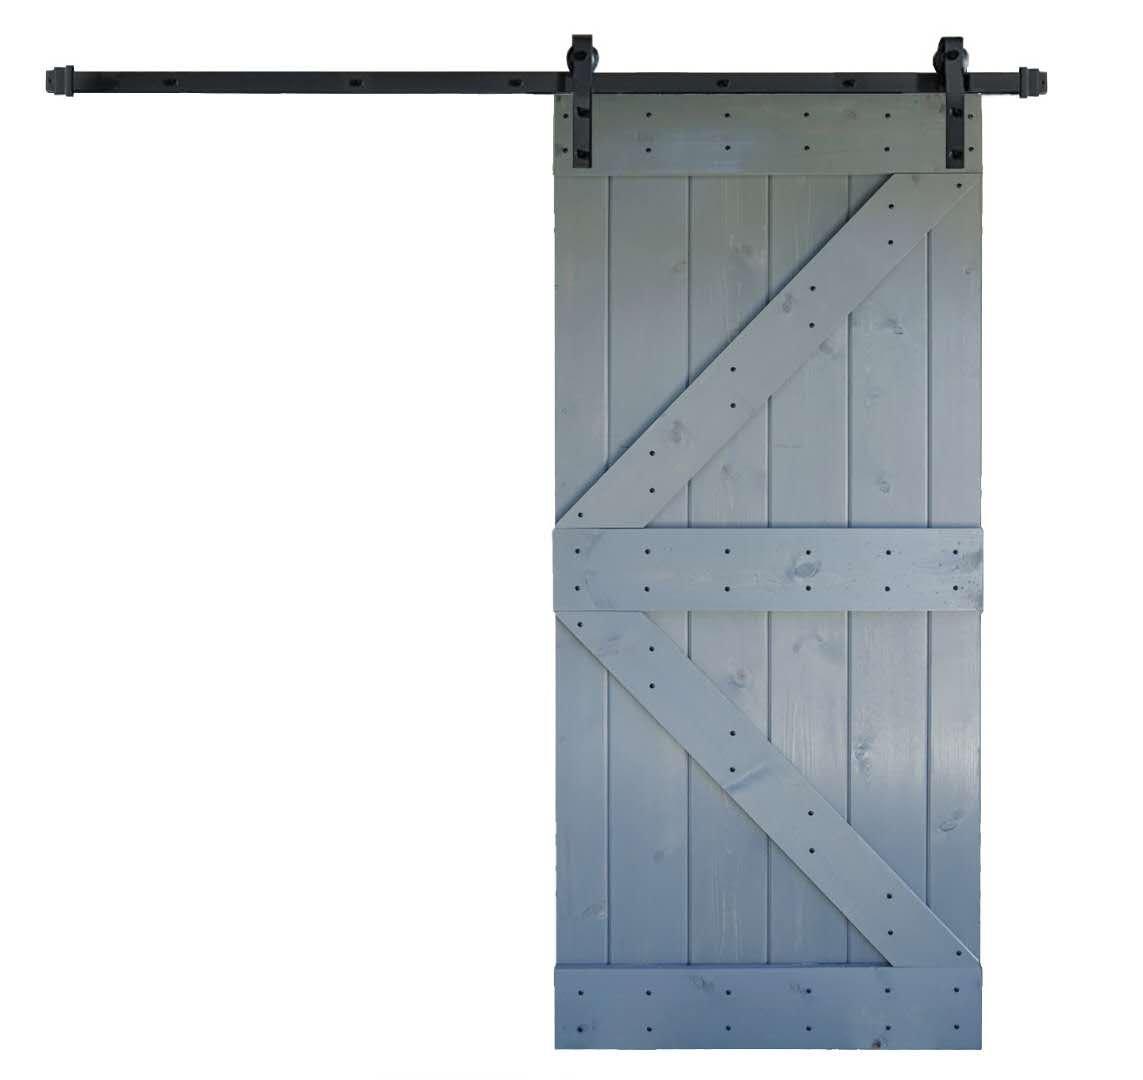 36inX84in K Series DIY Solid Interior Barn Knotty Wood Painted Door WELLHOME 6.6 FT Sliding Hardware Kit black